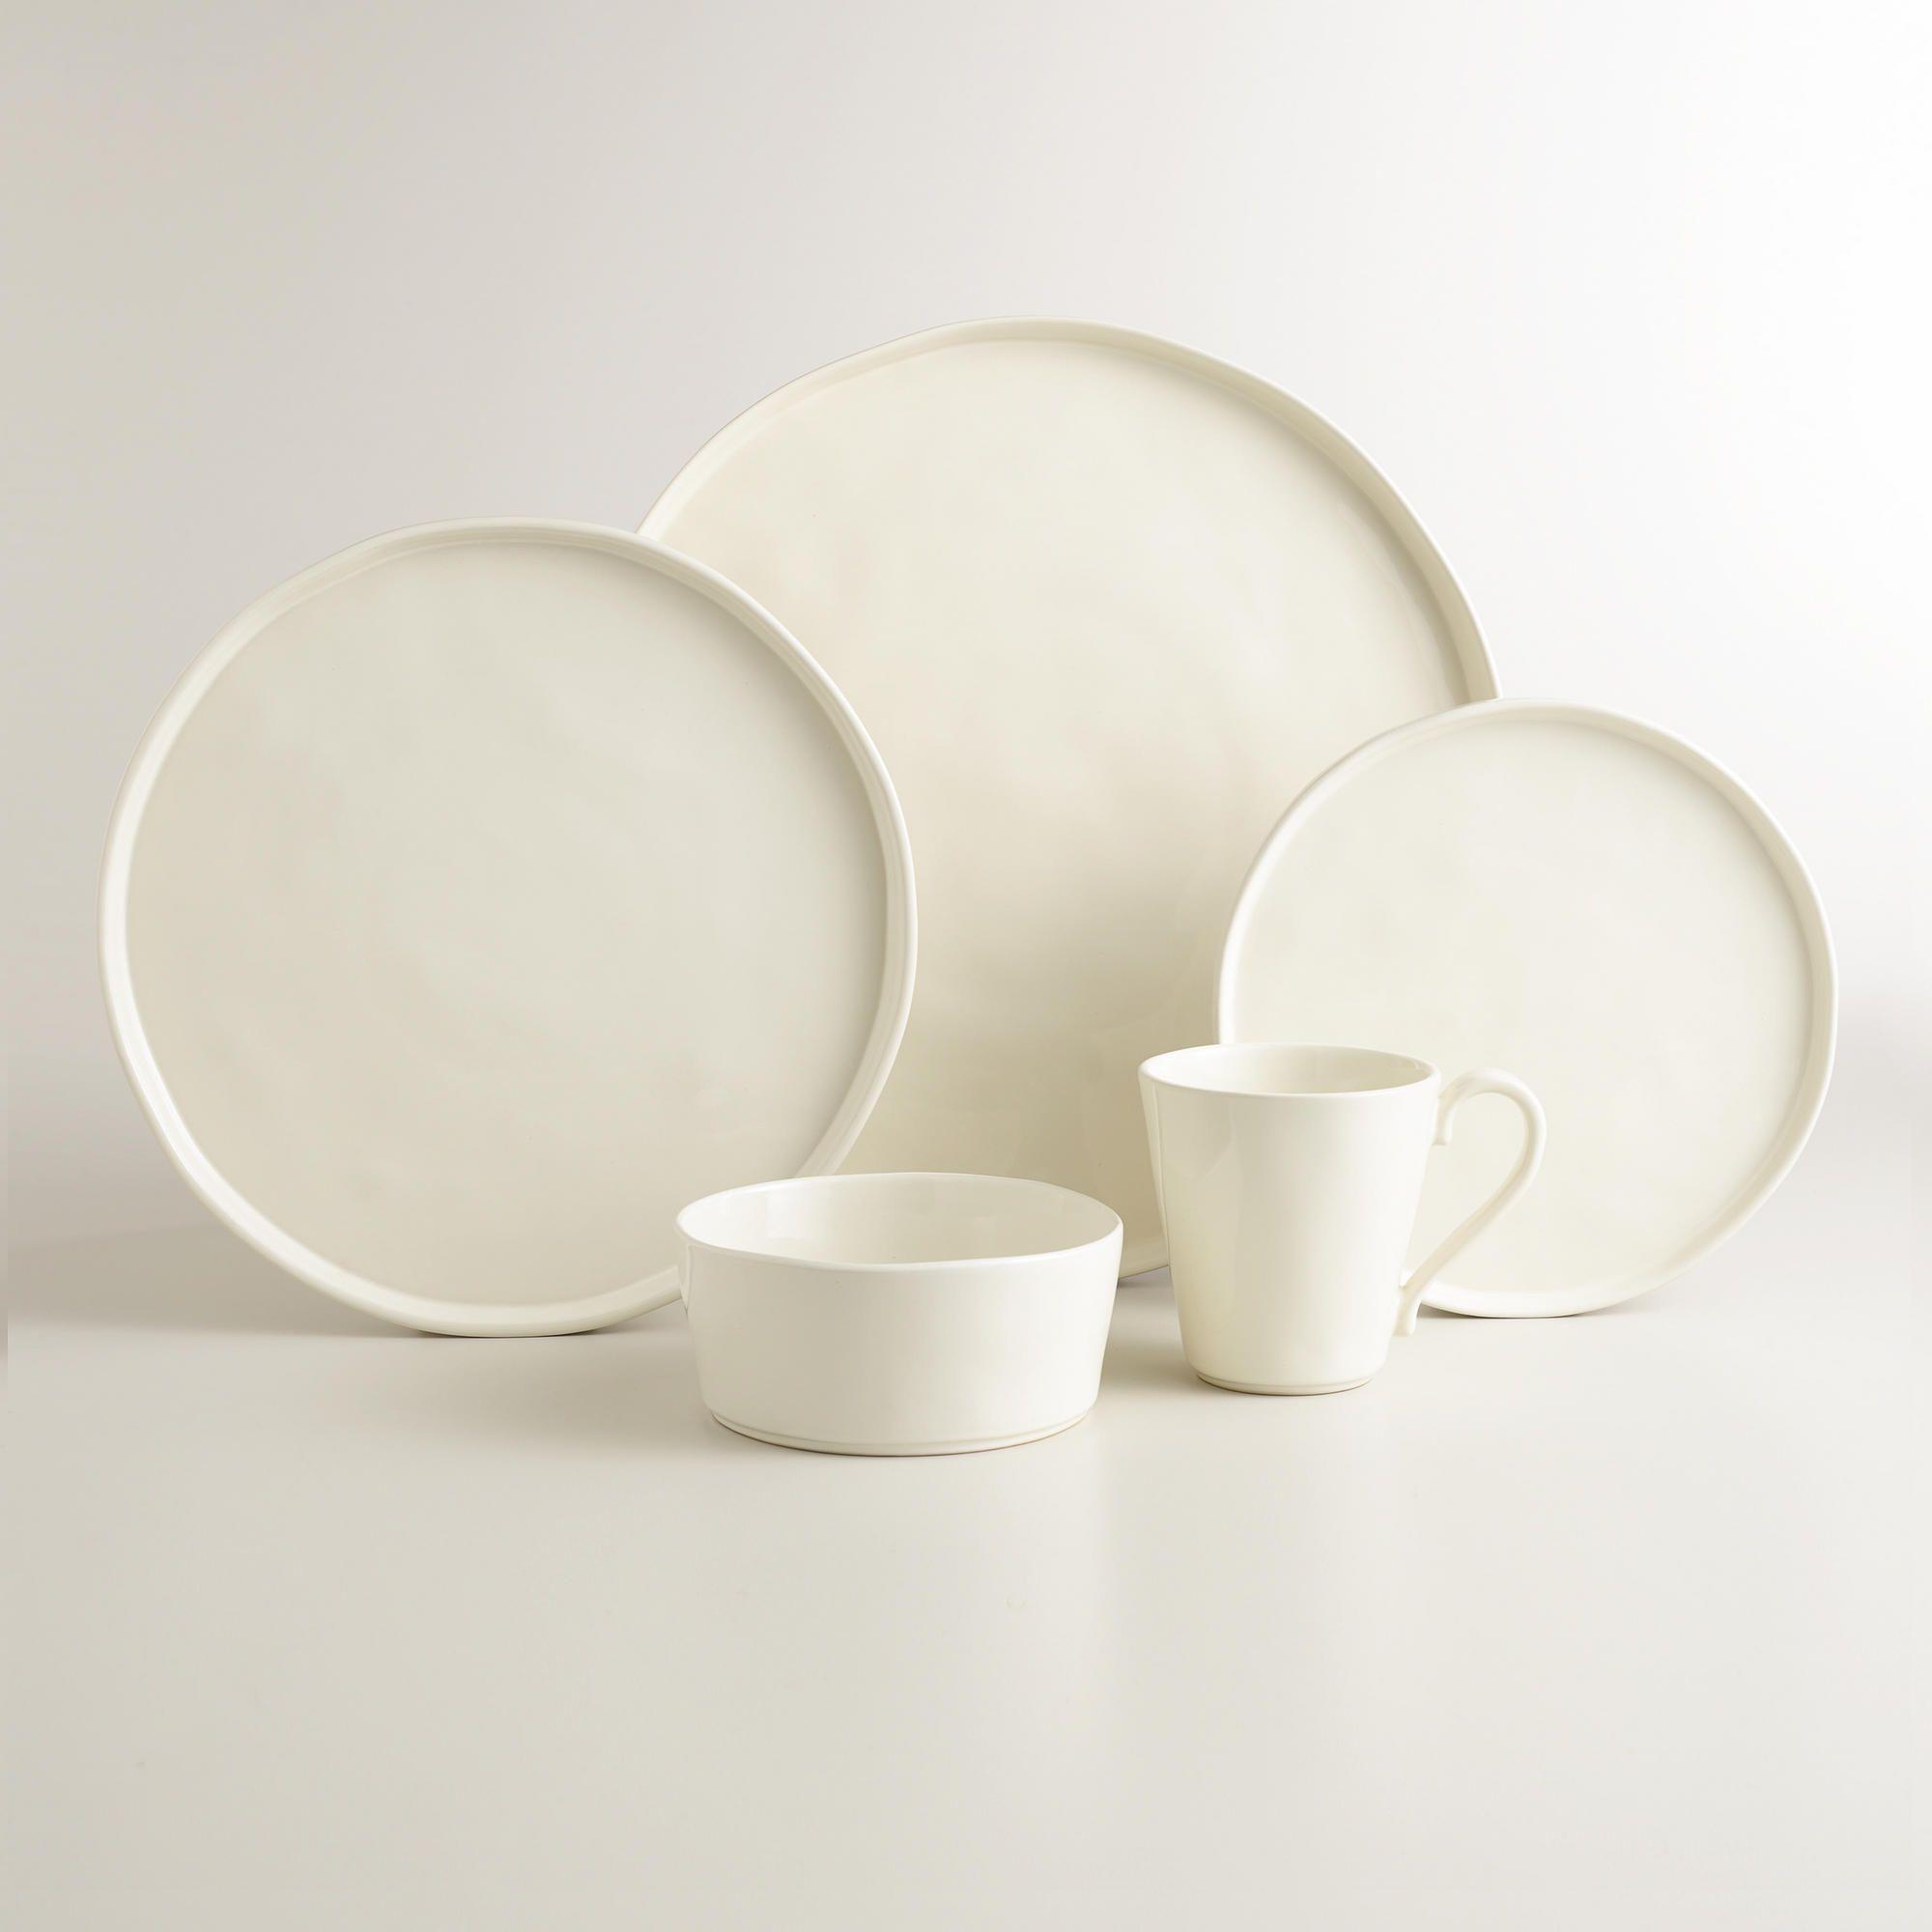 Ivory Organic Dinnerware & Ivory Organic Dinnerware | s p a c e s | Pinterest | Dinnerware ...